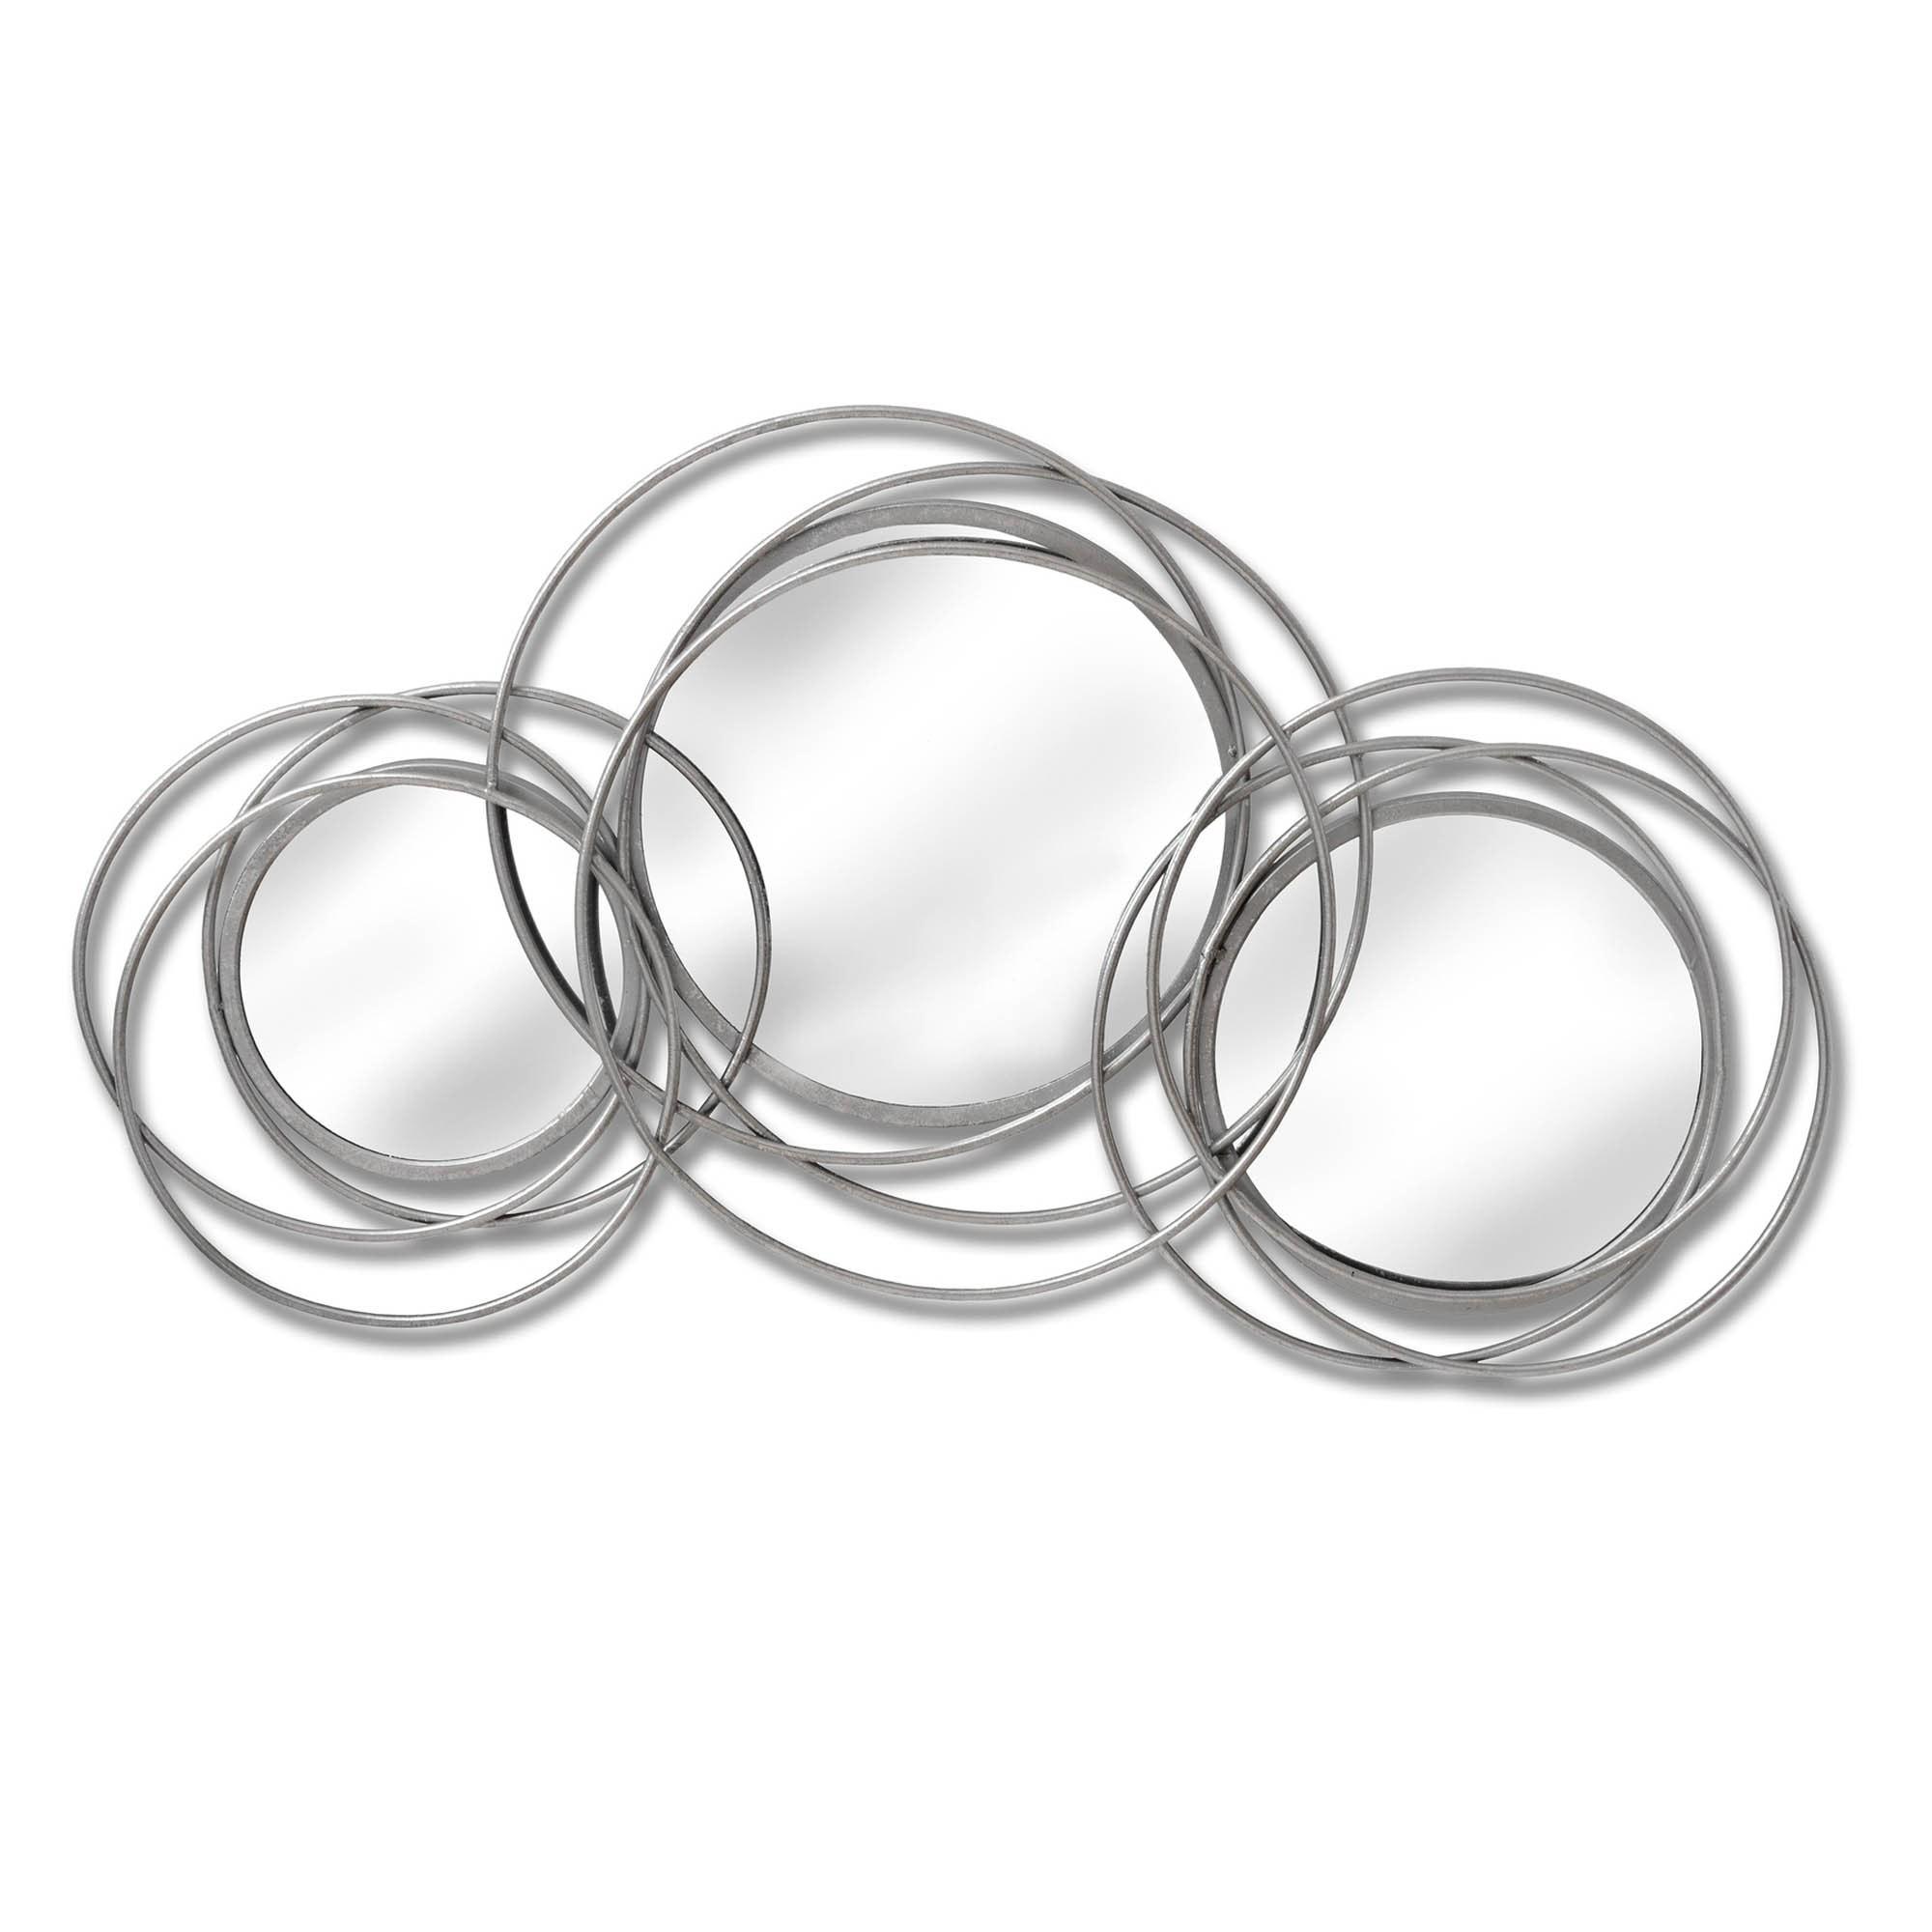 Silver Trio Multi Circled Wall Art Mirror Trio Mirror Round Mirrors